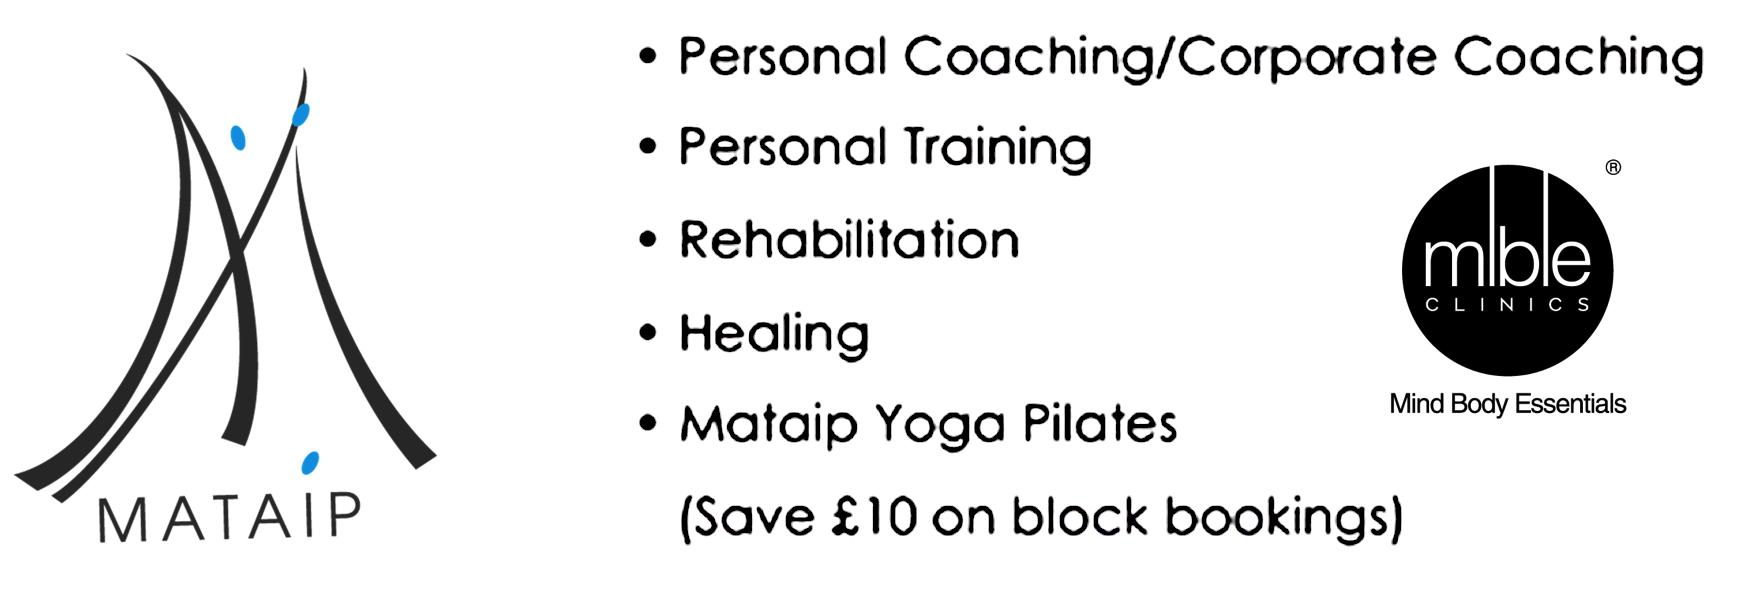 MATAIP yoga classes in Bradford